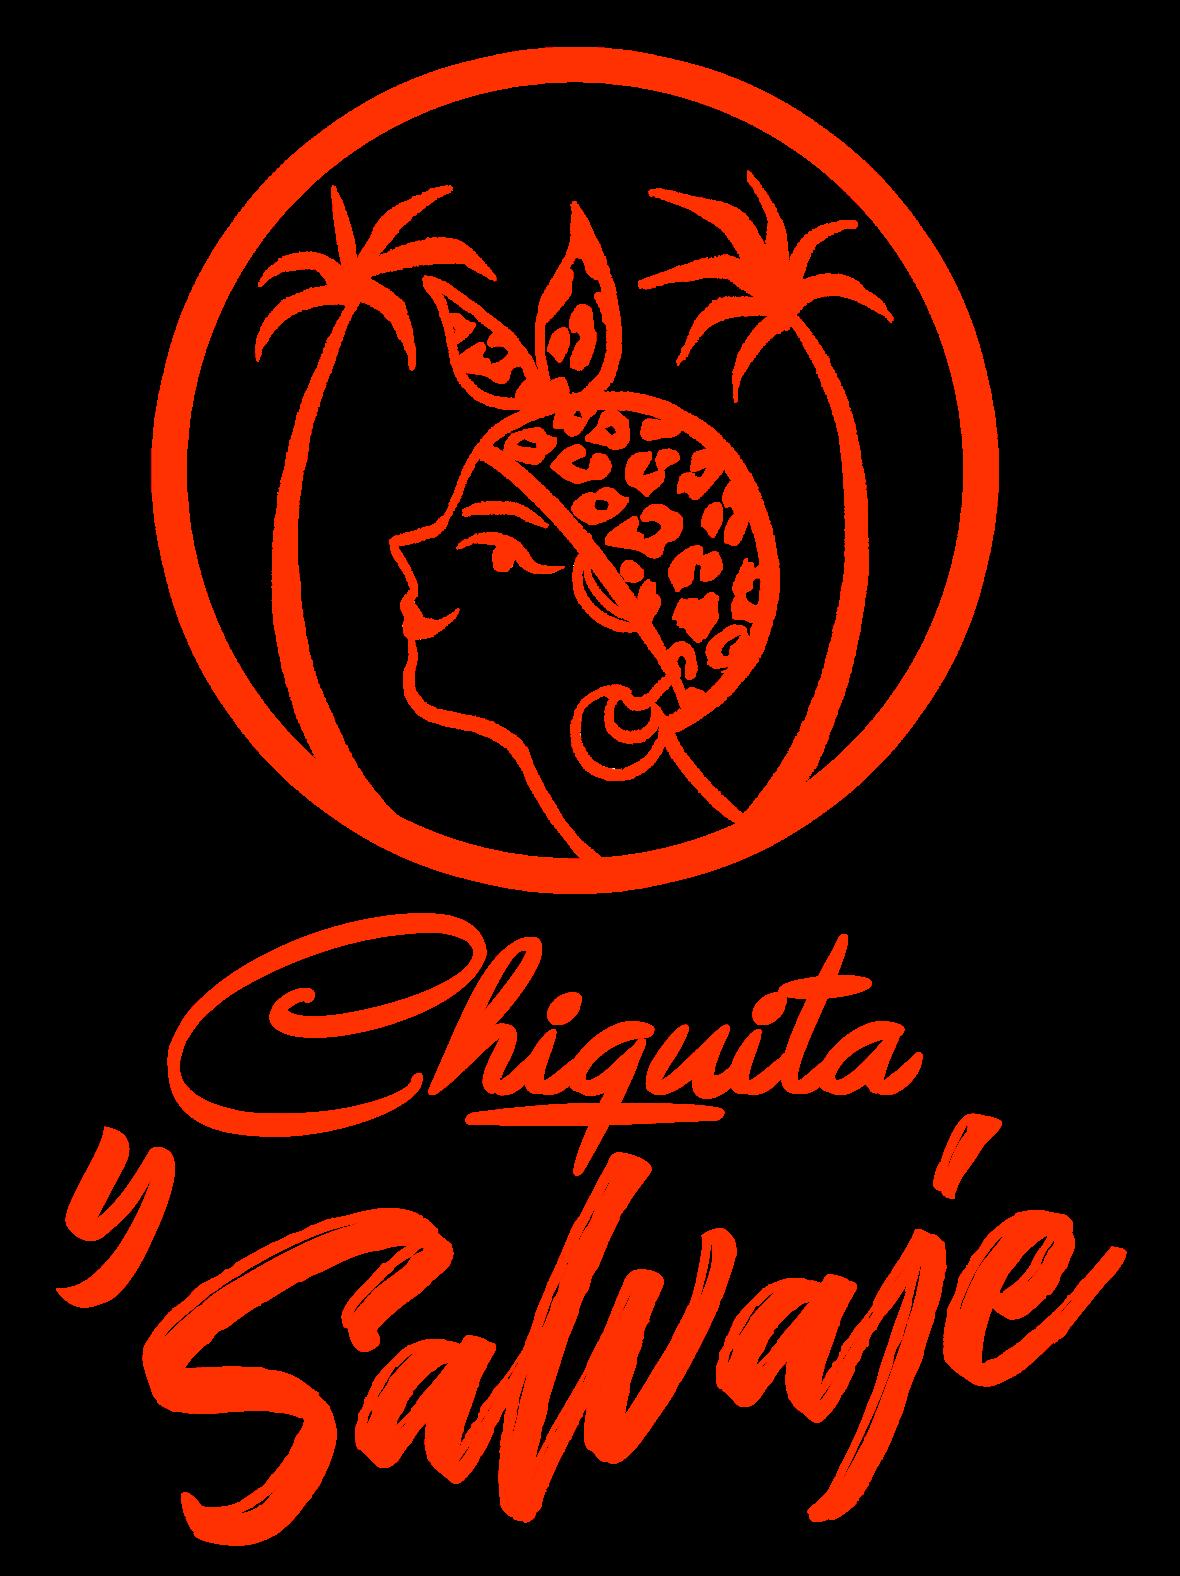 Logo2 Chiquita y salvaje